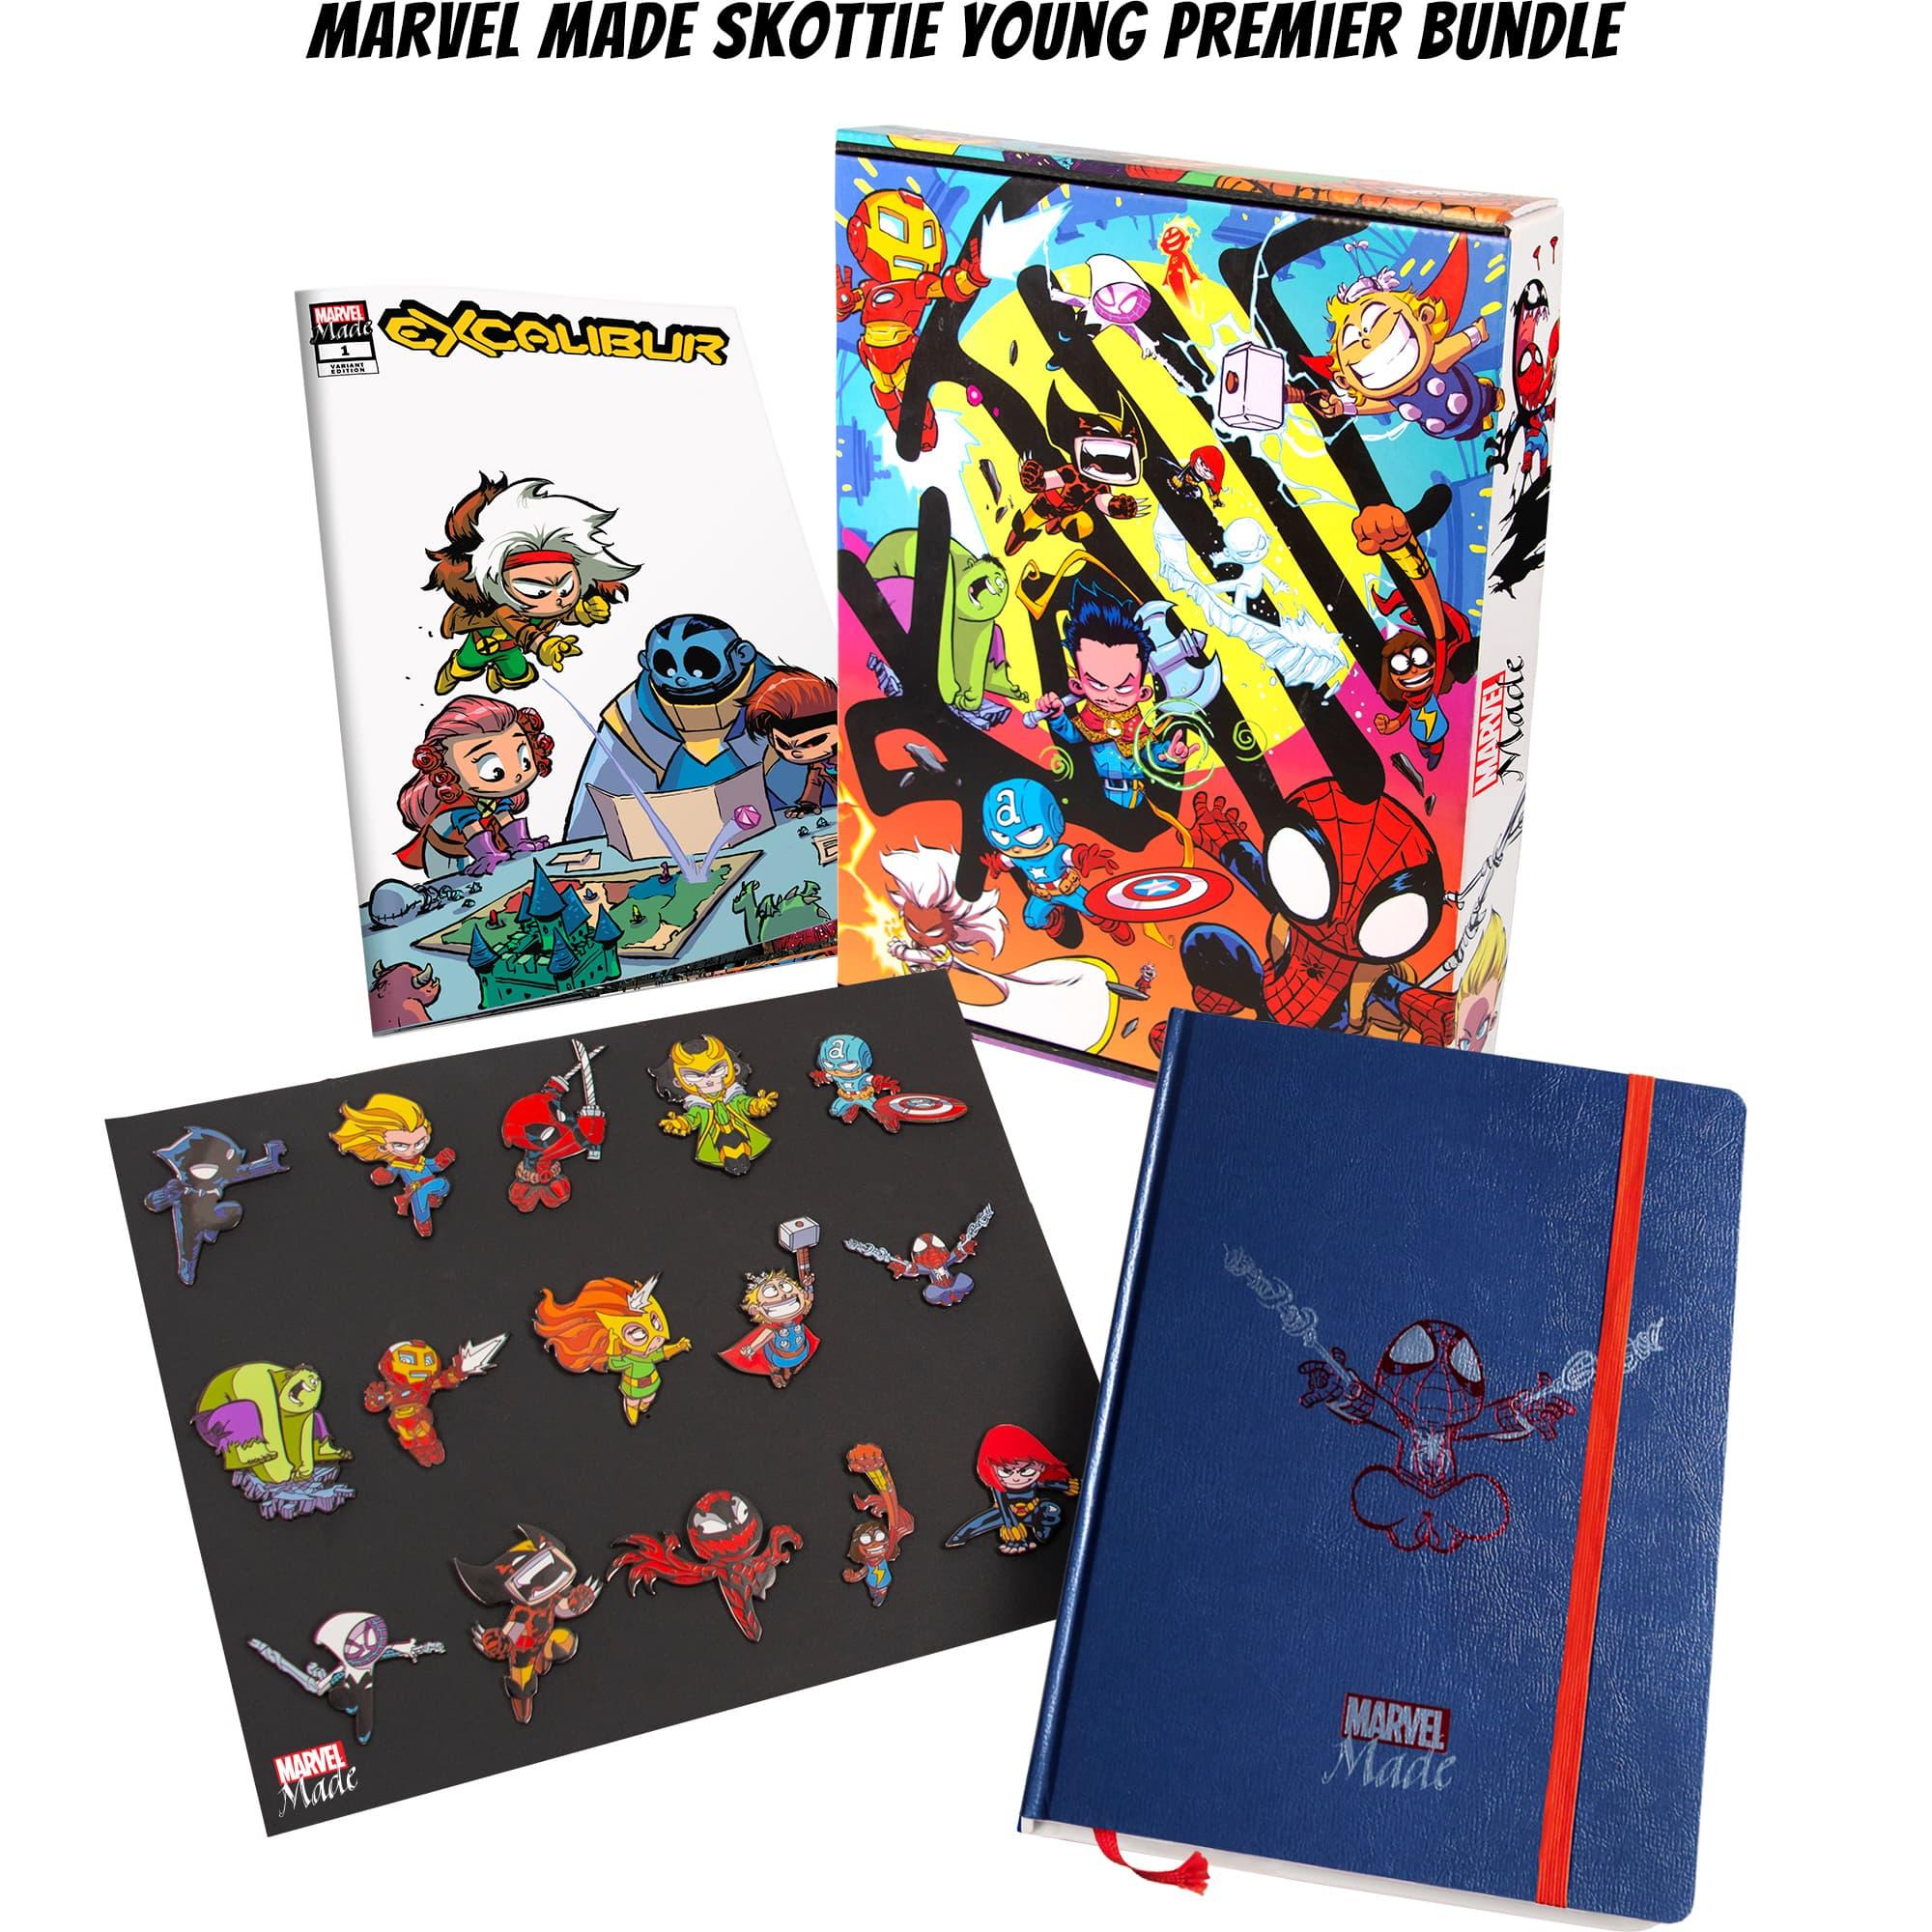 Marvel Made Skottie Young Premier Bundle